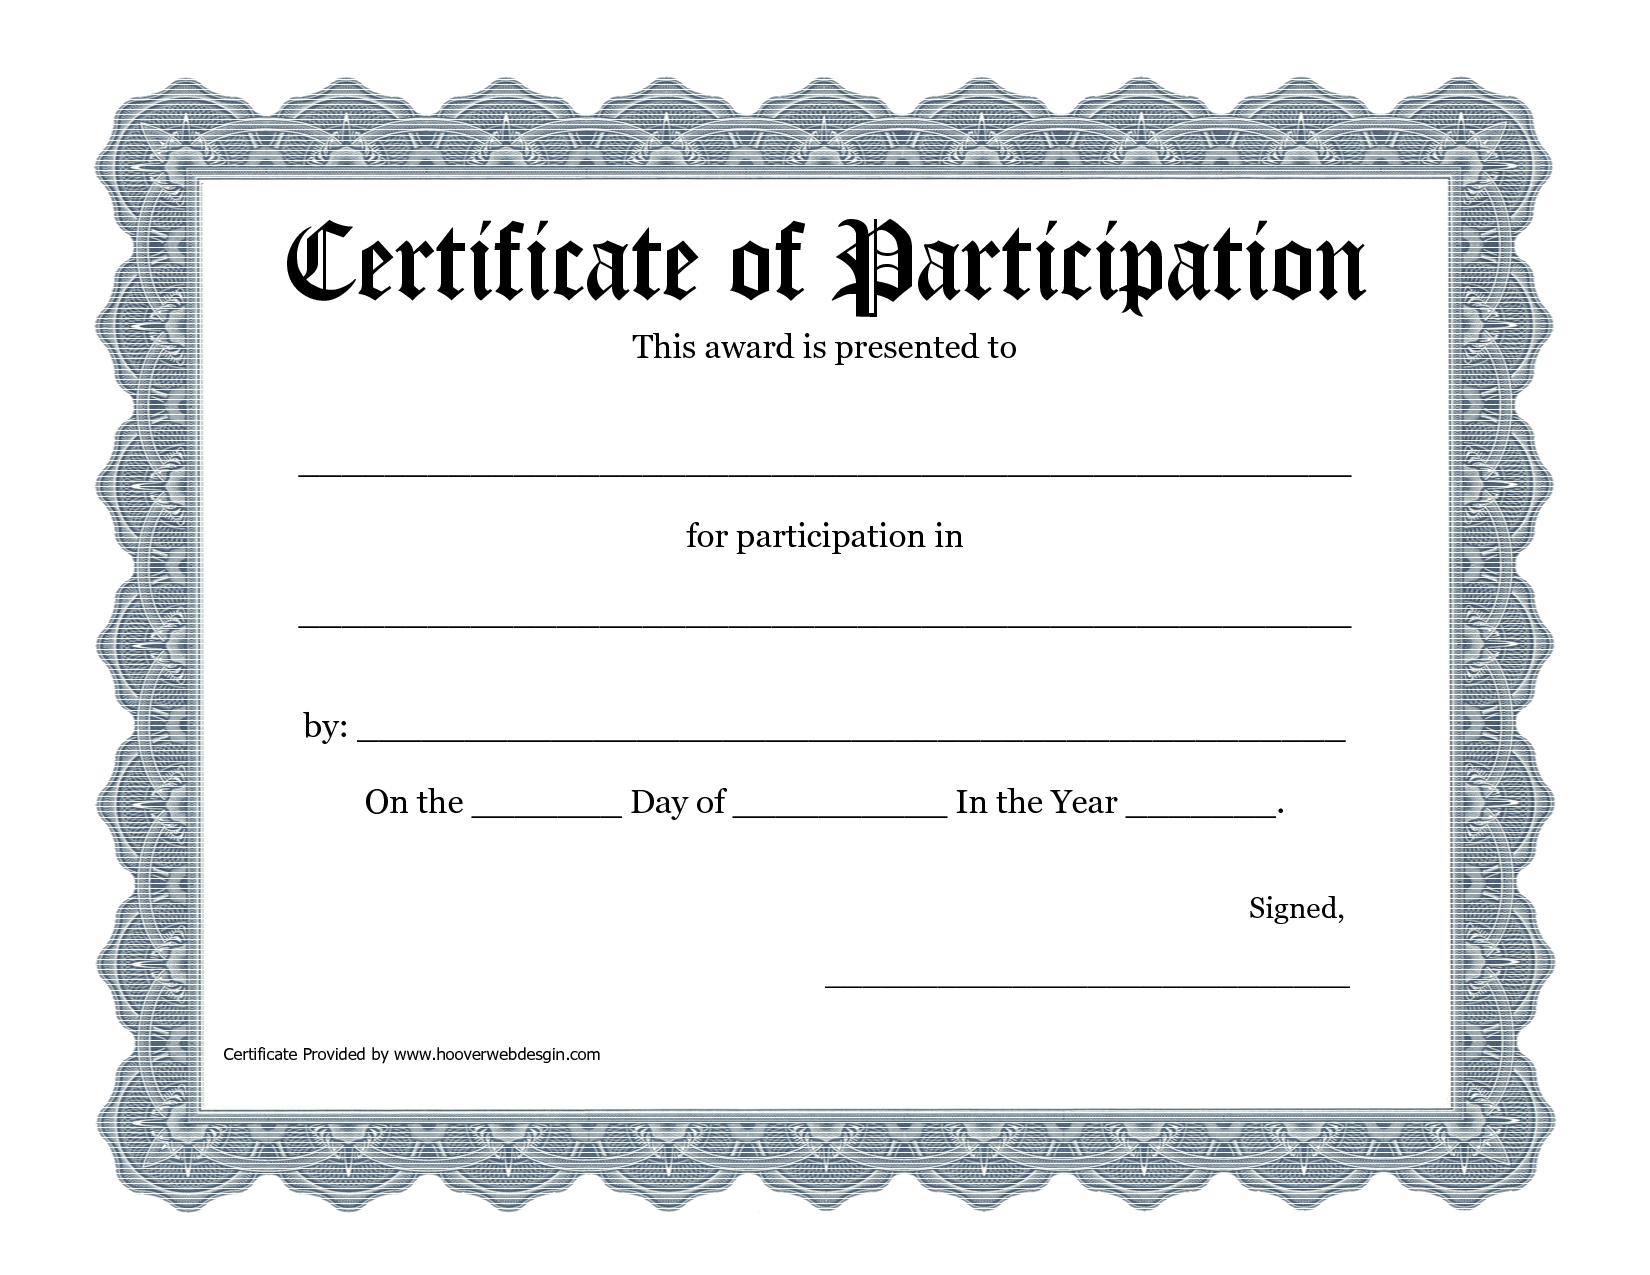 Free Printable Award Certificate Template - Bing Images throughout Free Funny Certificate Templates For Word